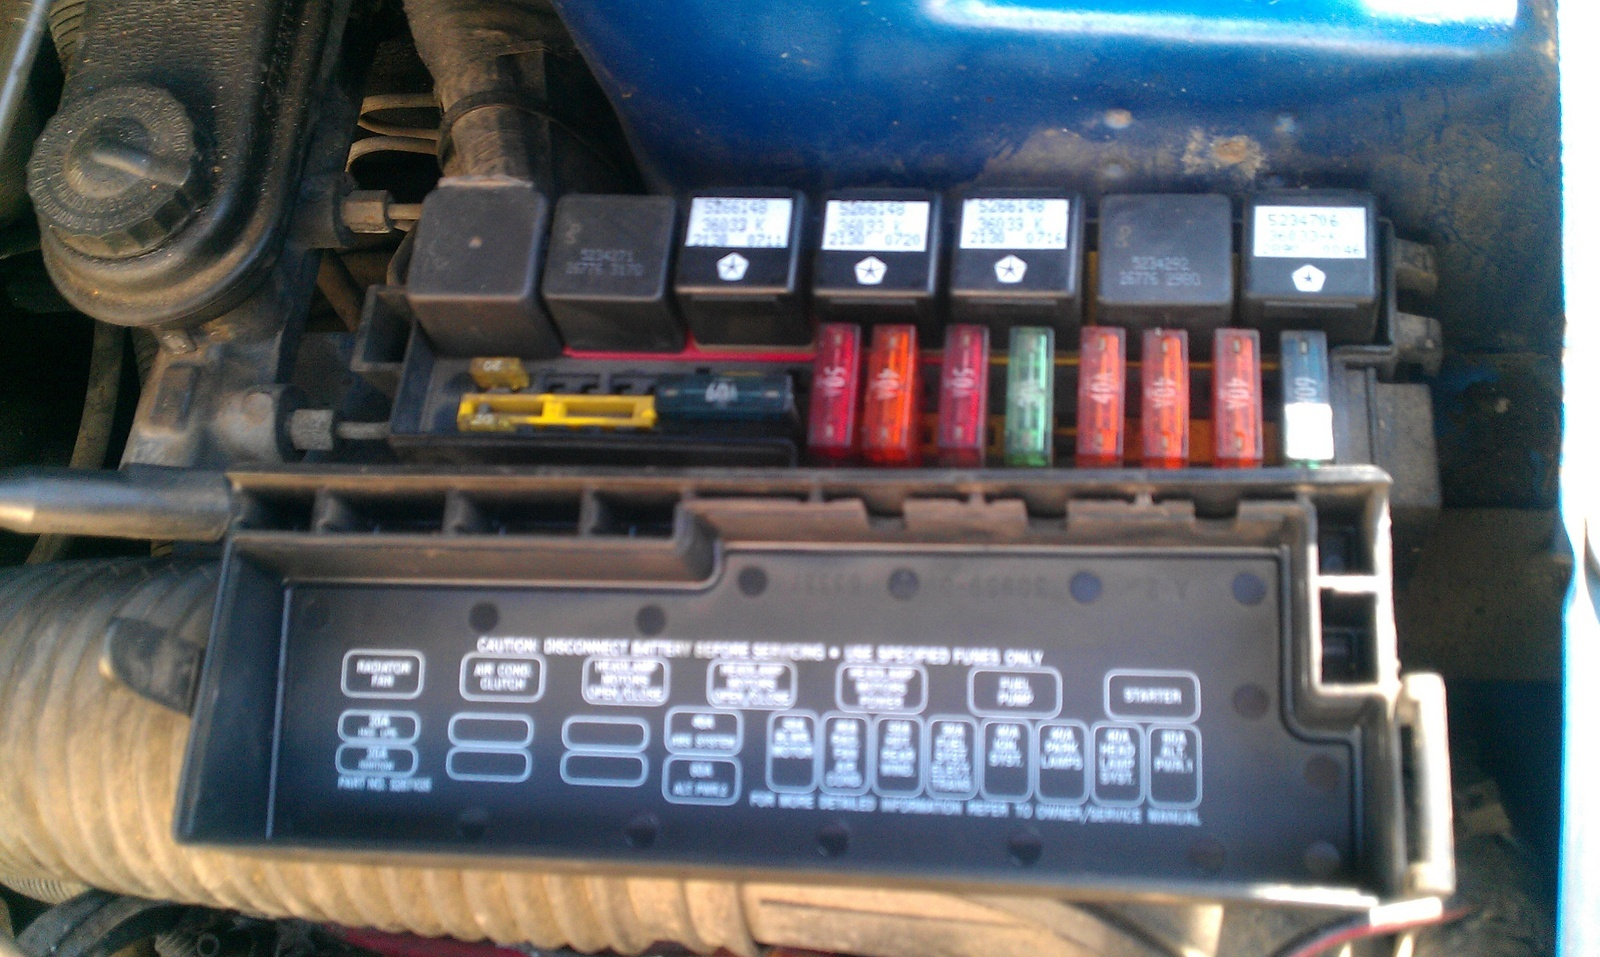 Astonishing Neon Fuel Pump Wiring Harness Wiring Library Wiring Cloud Picalendutblikvittorg